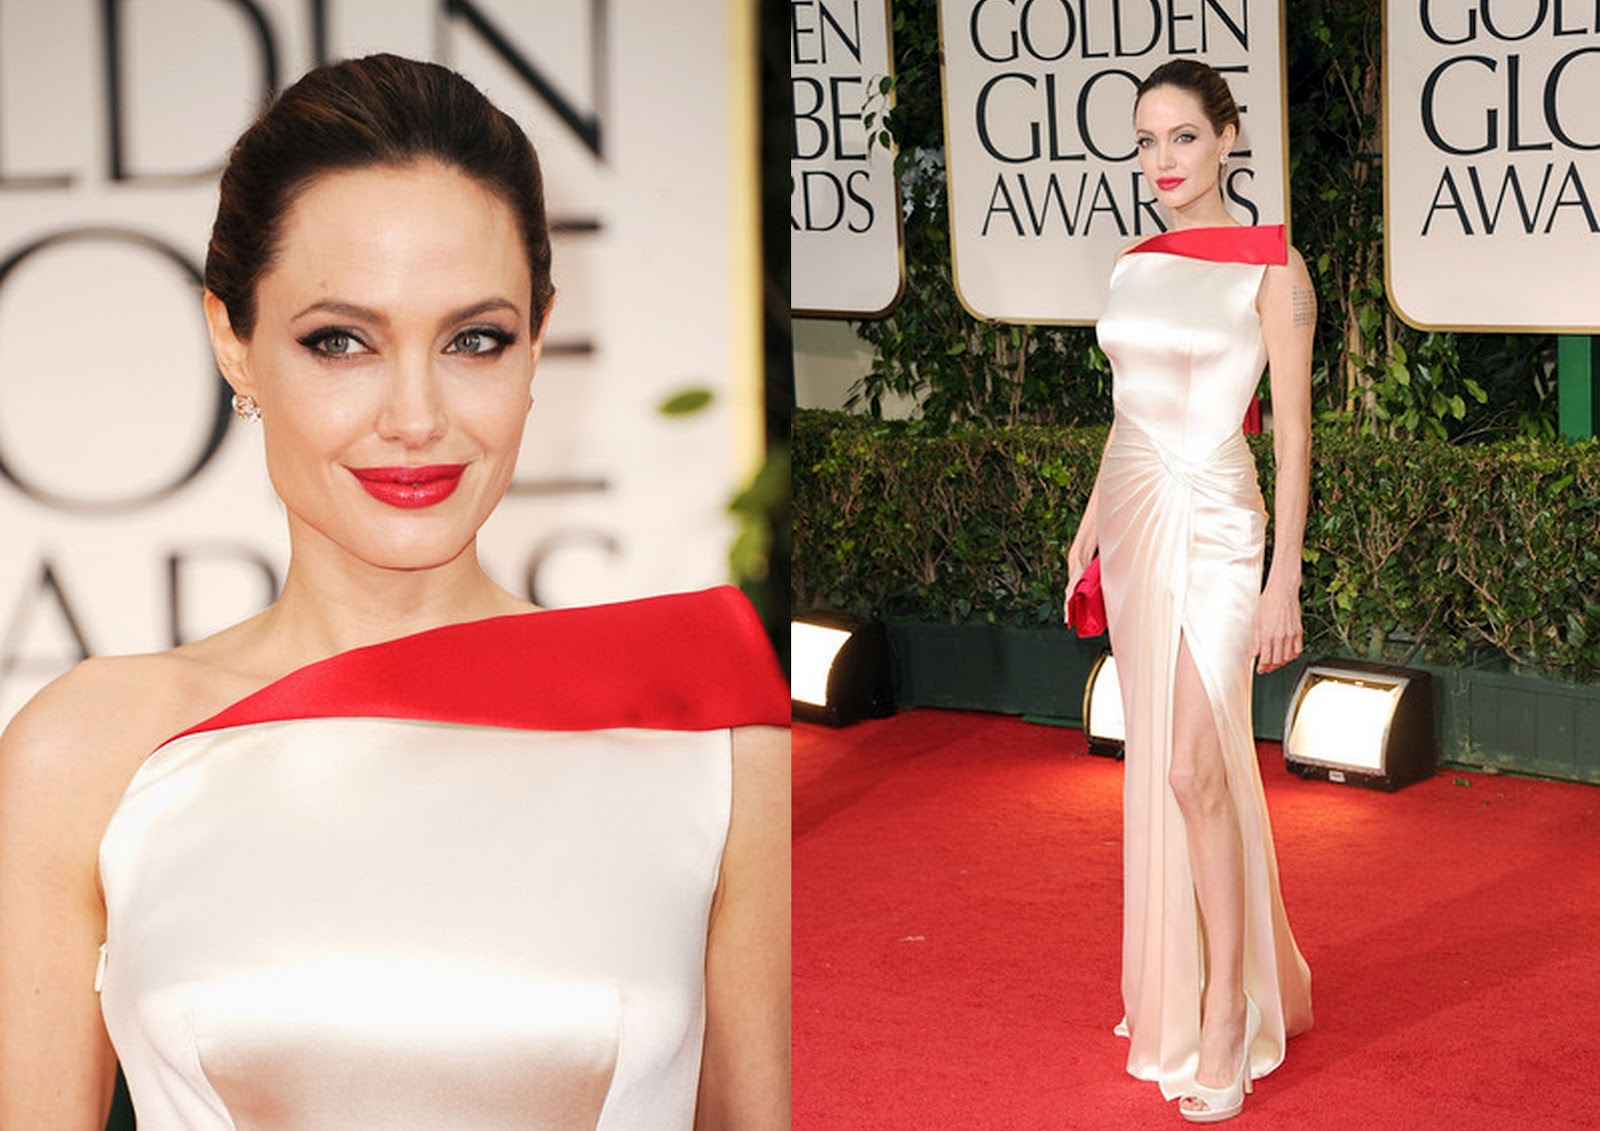 http://2.bp.blogspot.com/-OK2_TiVbD34/T4GxQYw-U_I/AAAAAAAAAAk/ub87LuE1UWU/s1600/Angelina+Jolie+2012+Red+Carpet.jpg